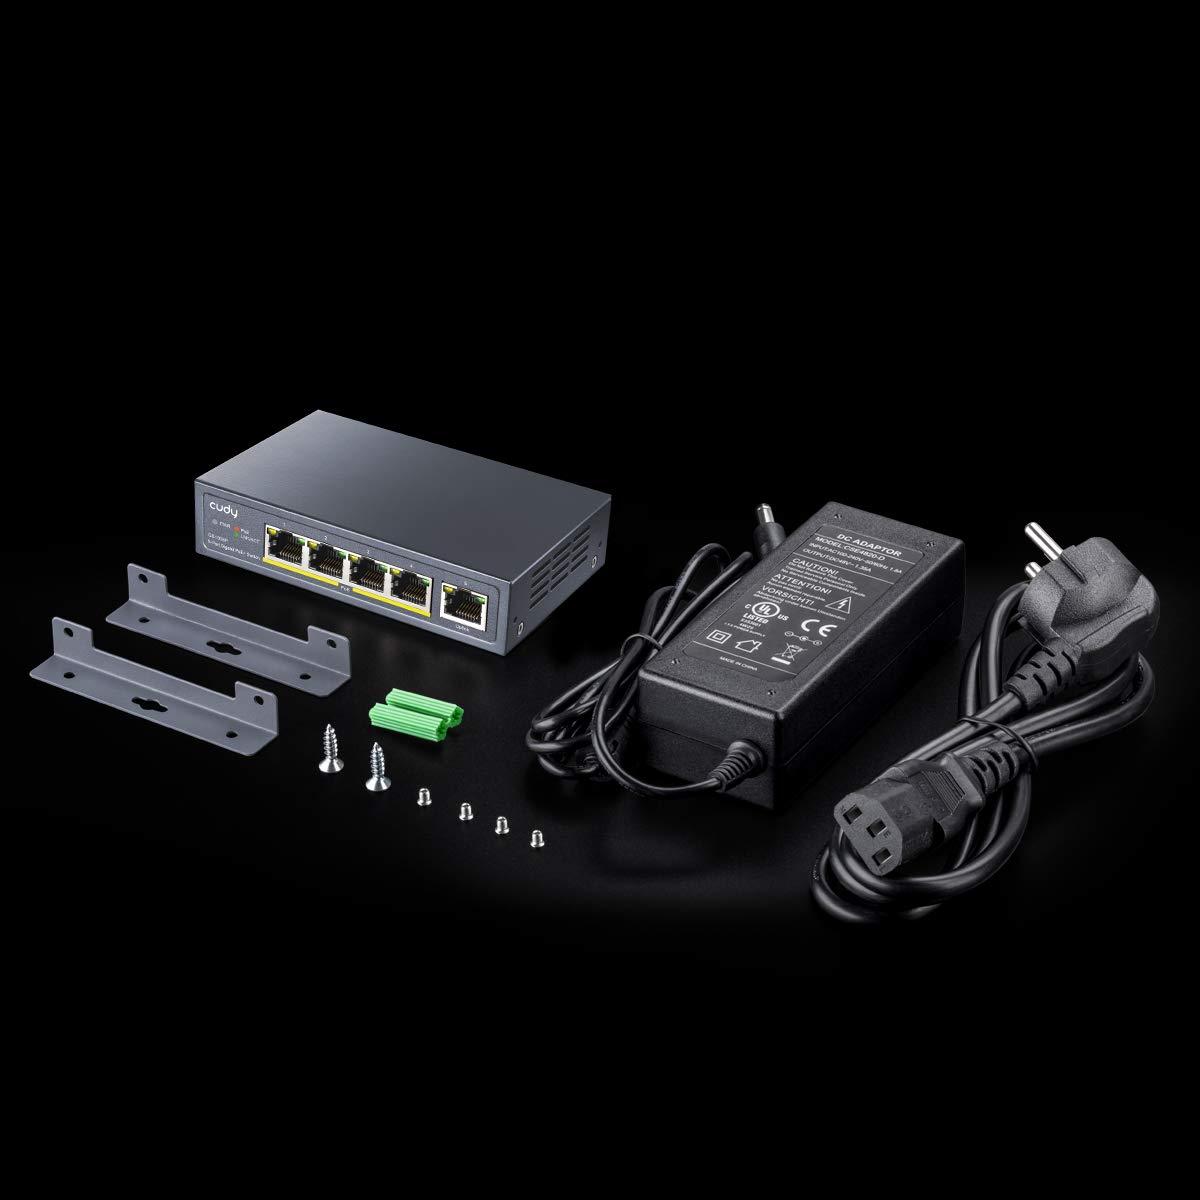 Cudy GS1005P Switch Ethernet Gigabit 5 Porte Poe+ 60W 802.3af//at No Alimentazione Aggiuntiva 4 Porte 10//100//1000Mbps Poe+ Switch Unmanaged